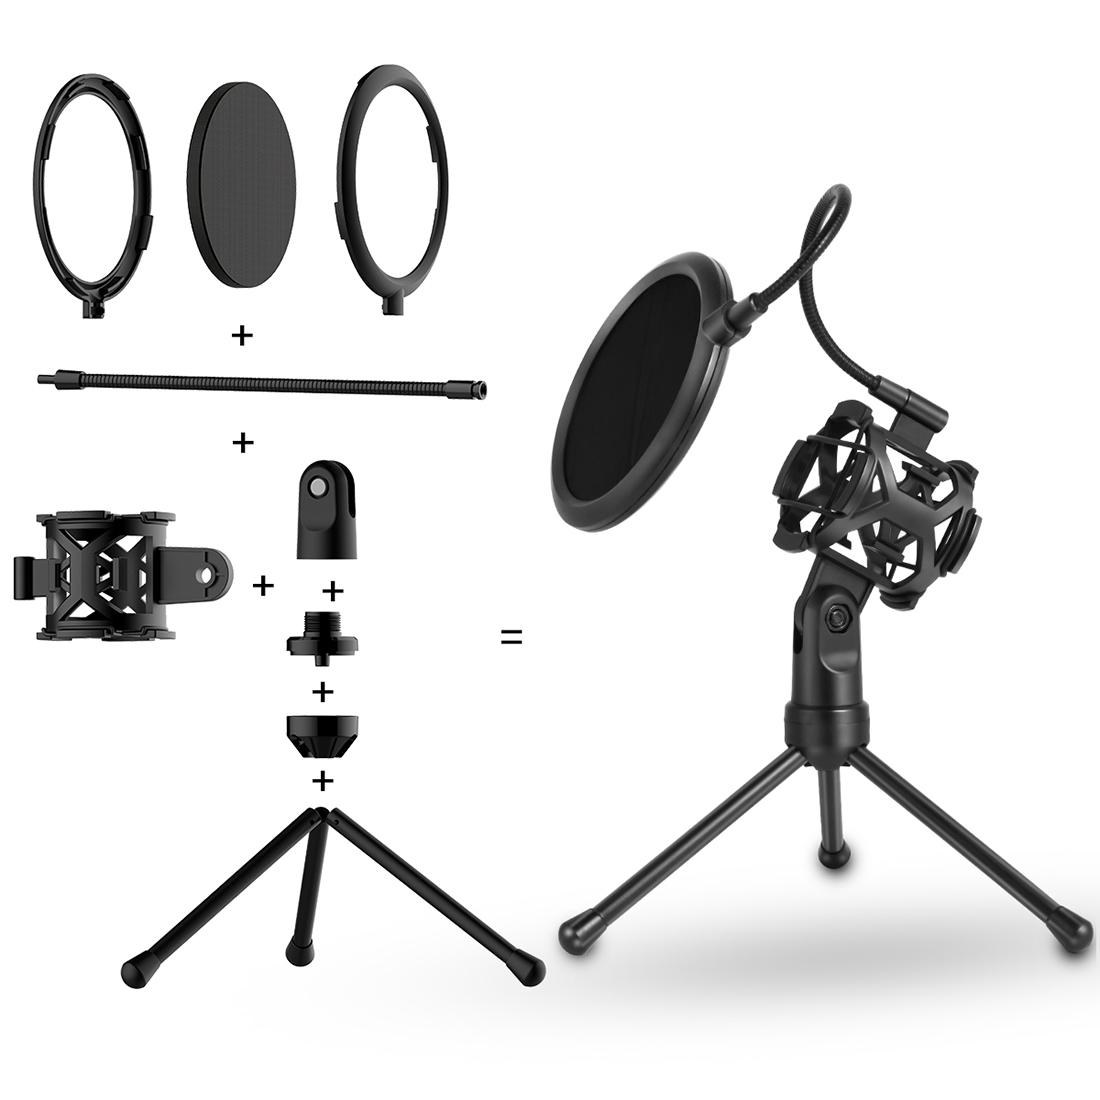 Yanmai PS-2 Recording Microphone Studio Wind Screen Pop Filter Mic Mask Shield, For Studio Recording, Live Broadcast, Live Show, KTV, Online Chat, etc (Black)